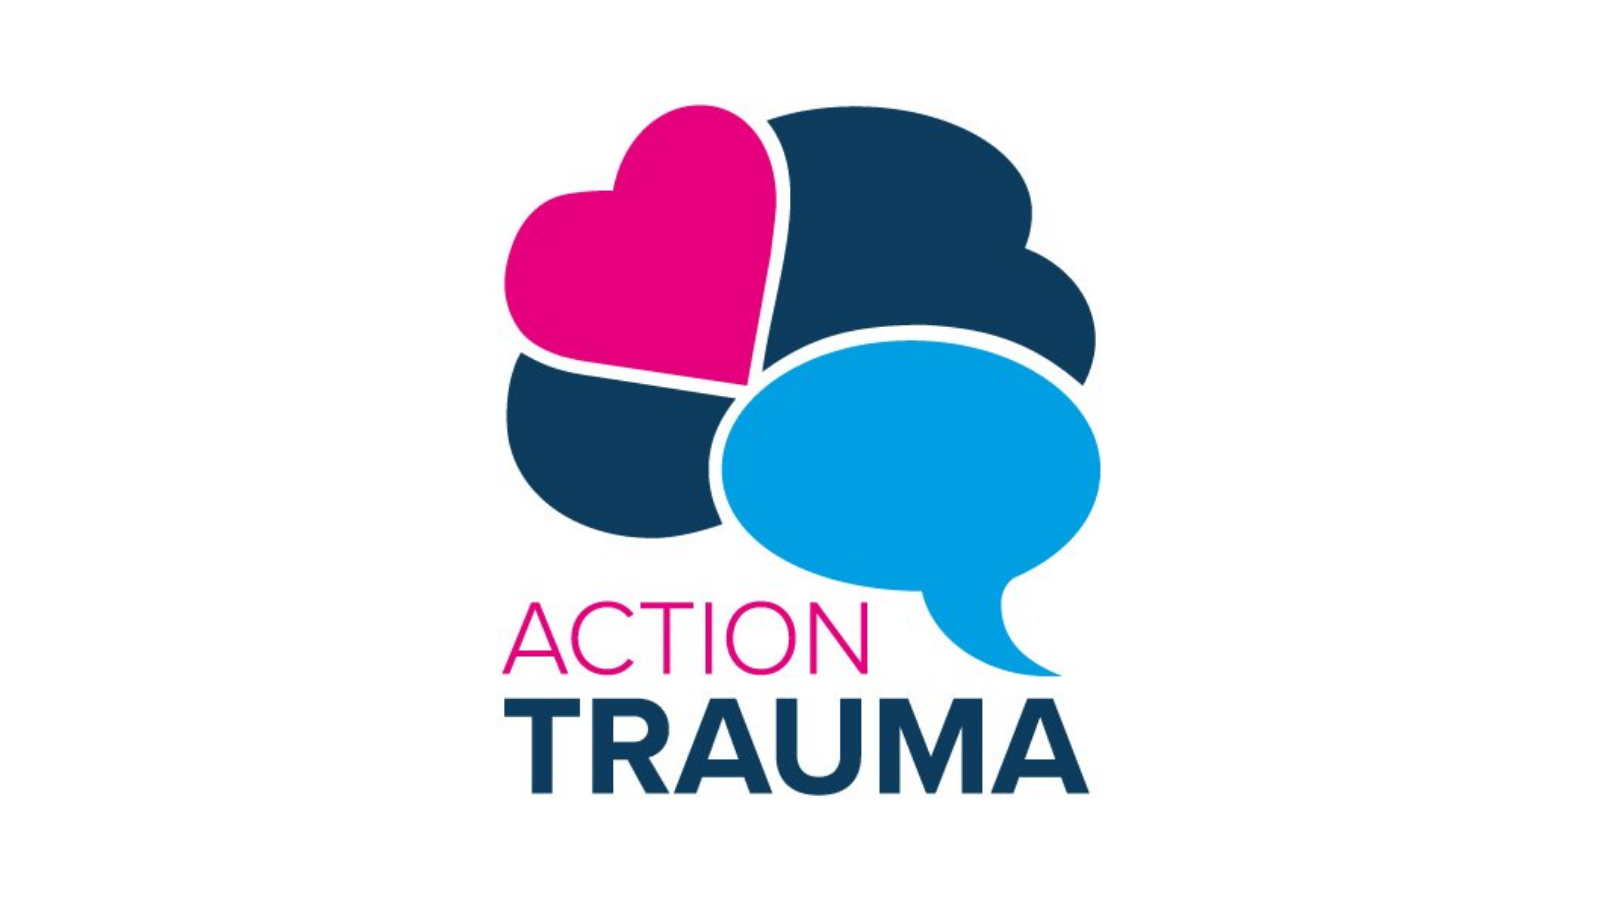 Action Trauma